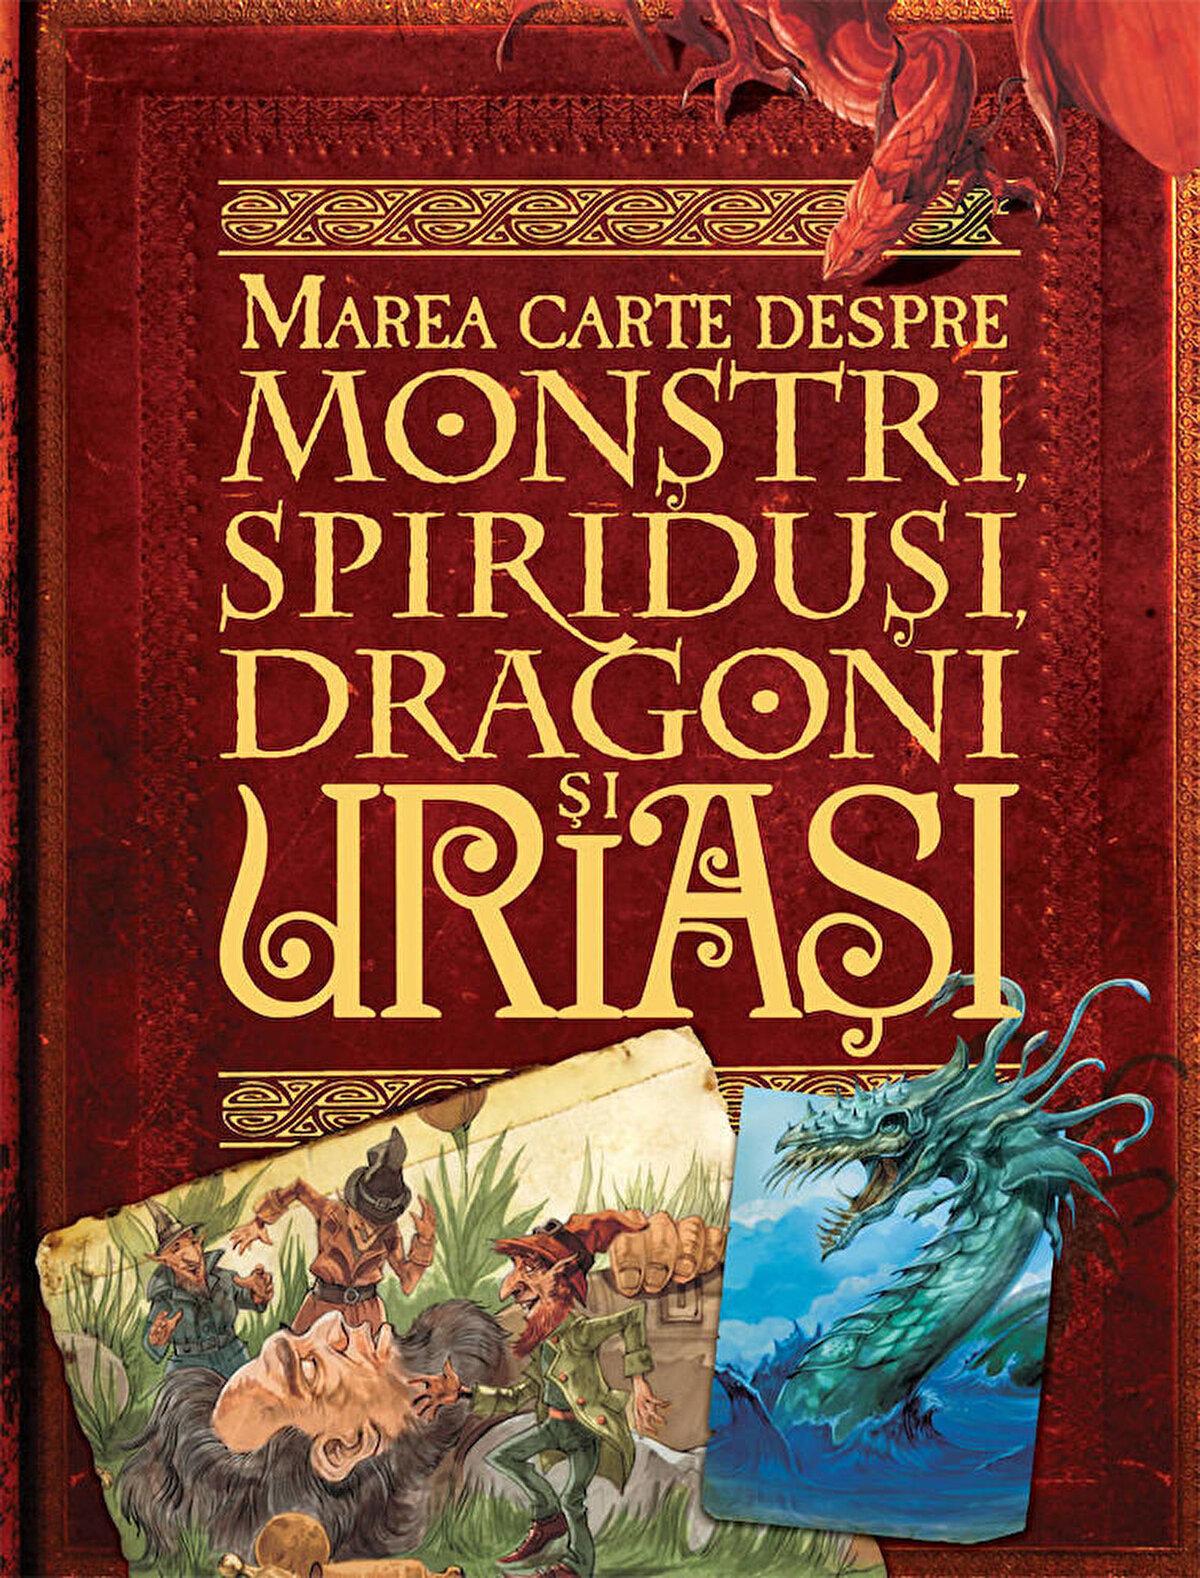 Marea carte despre monstri, spiridusi, dragoni si uriasi